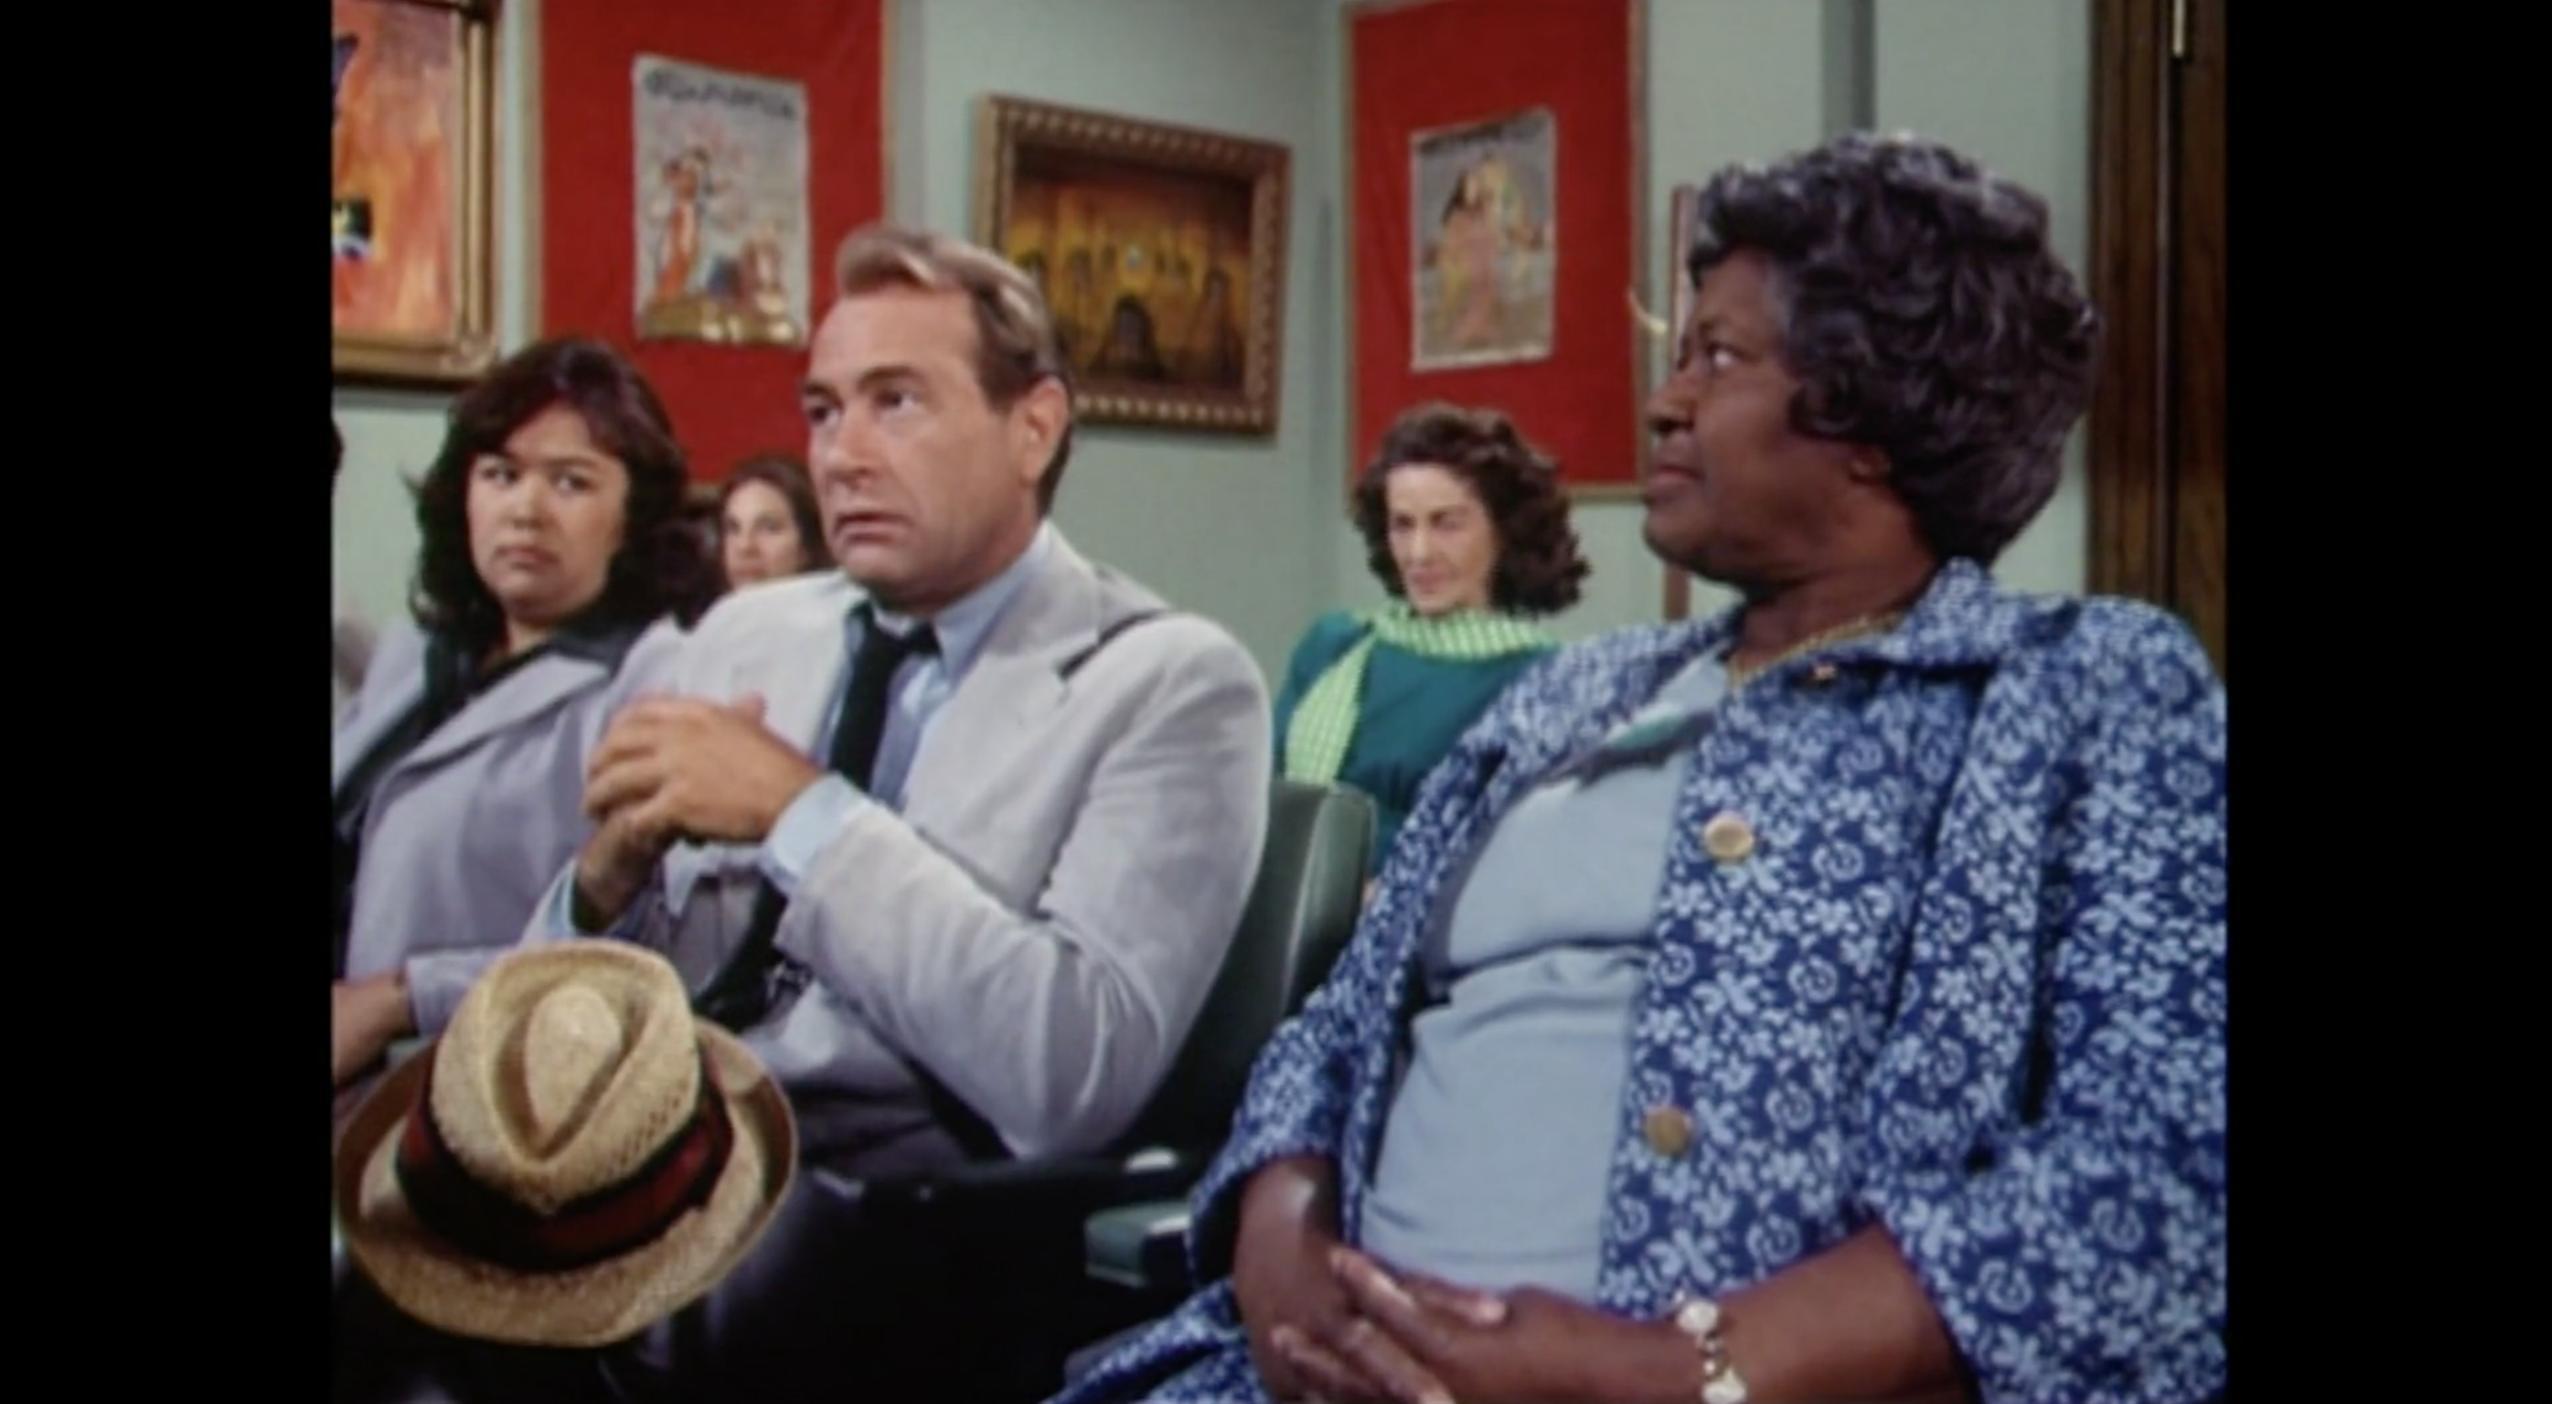 Ella Mae Brown, Darren McGavin, and Kellye Nakahara in Kolchak: The Night Stalker (1974)